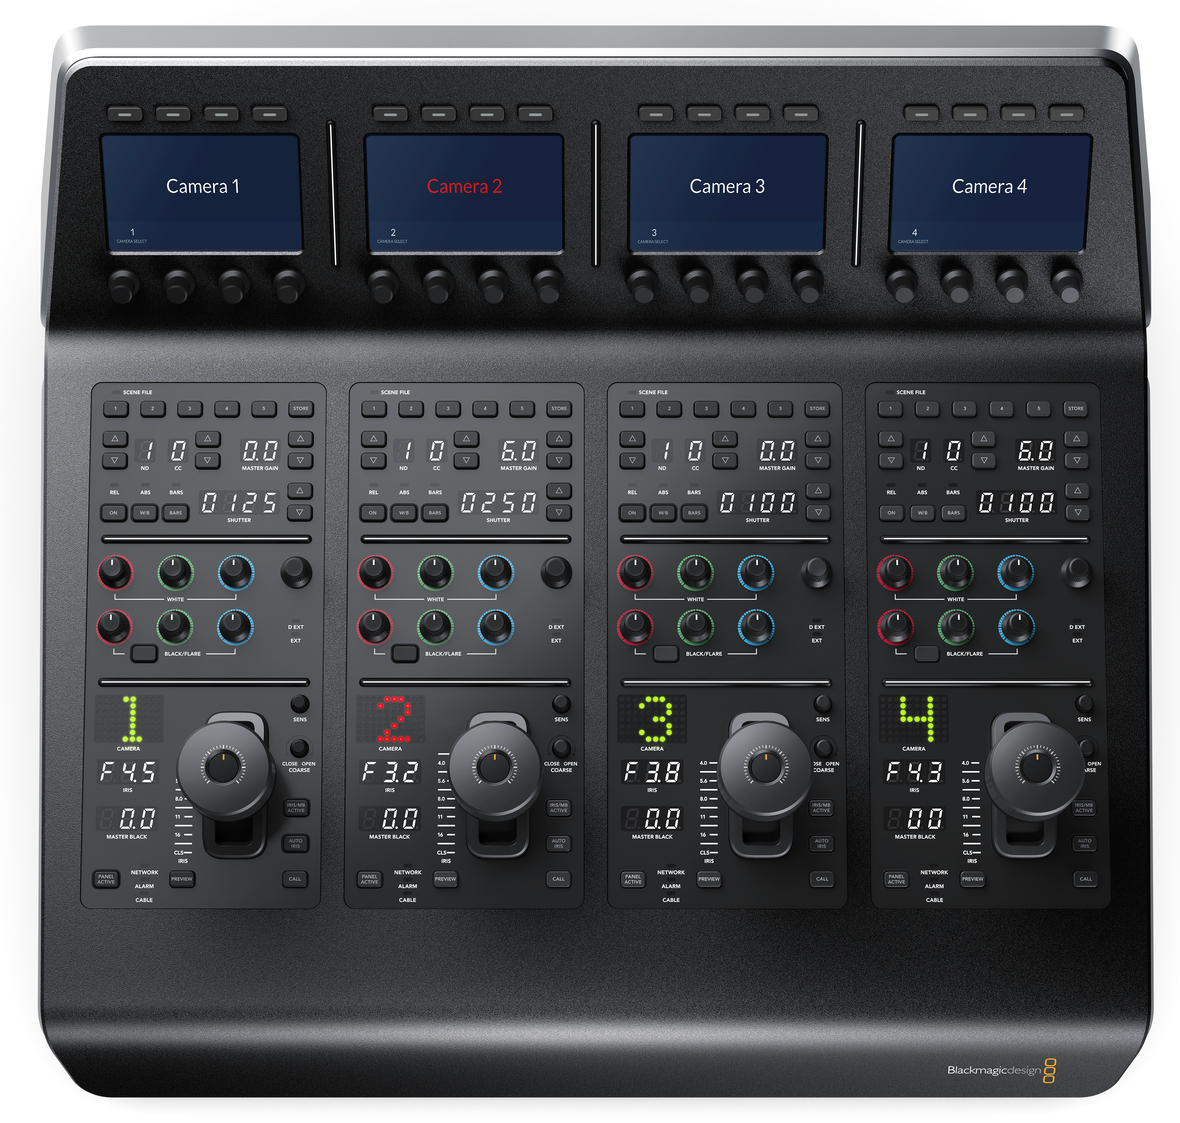 ATEM Camera Control Panel Top